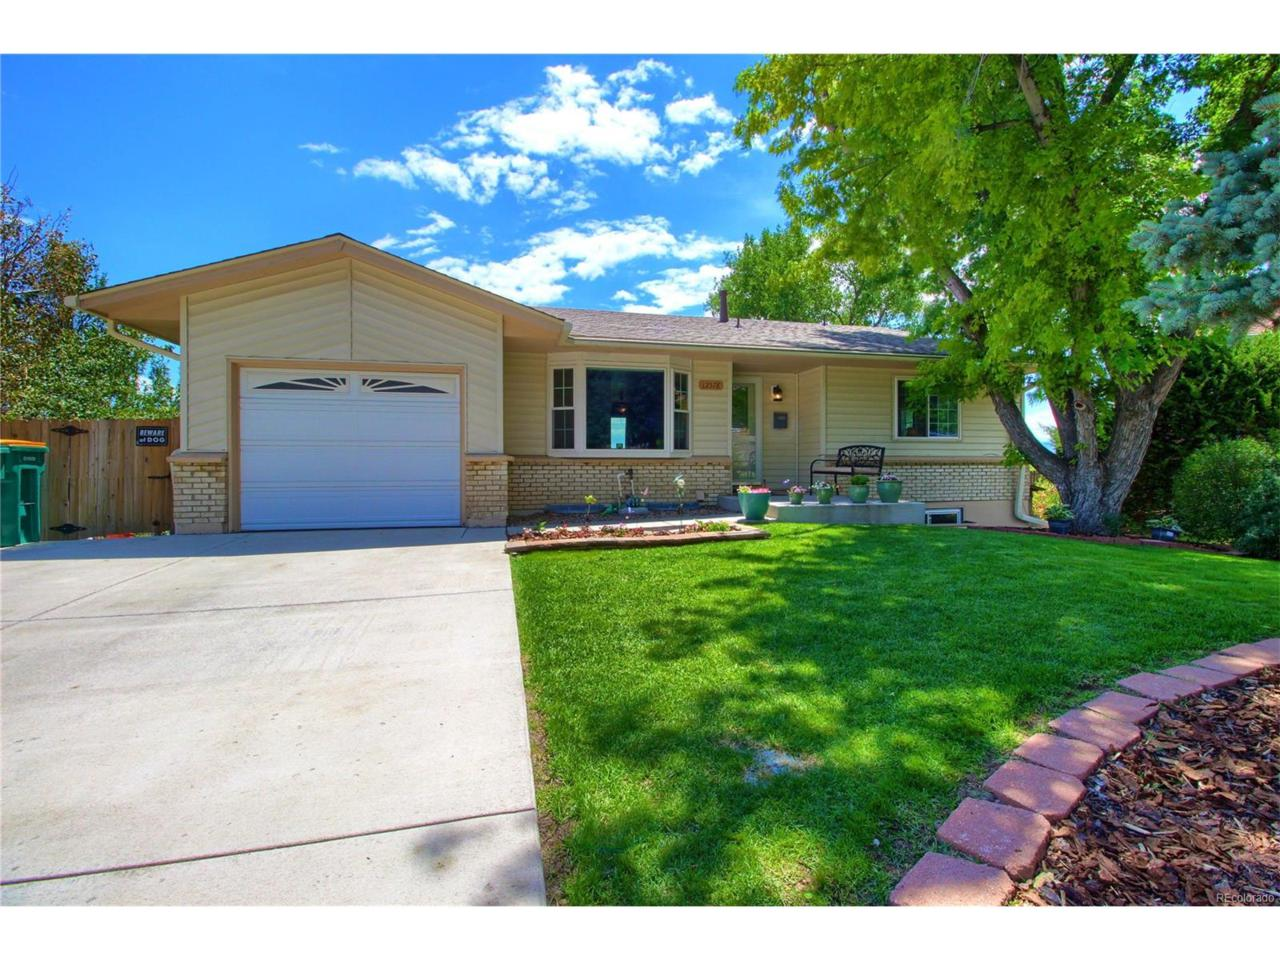 12578 W Hawaii Avenue, Lakewood, CO 80228 (MLS #2040801) :: 8z Real Estate